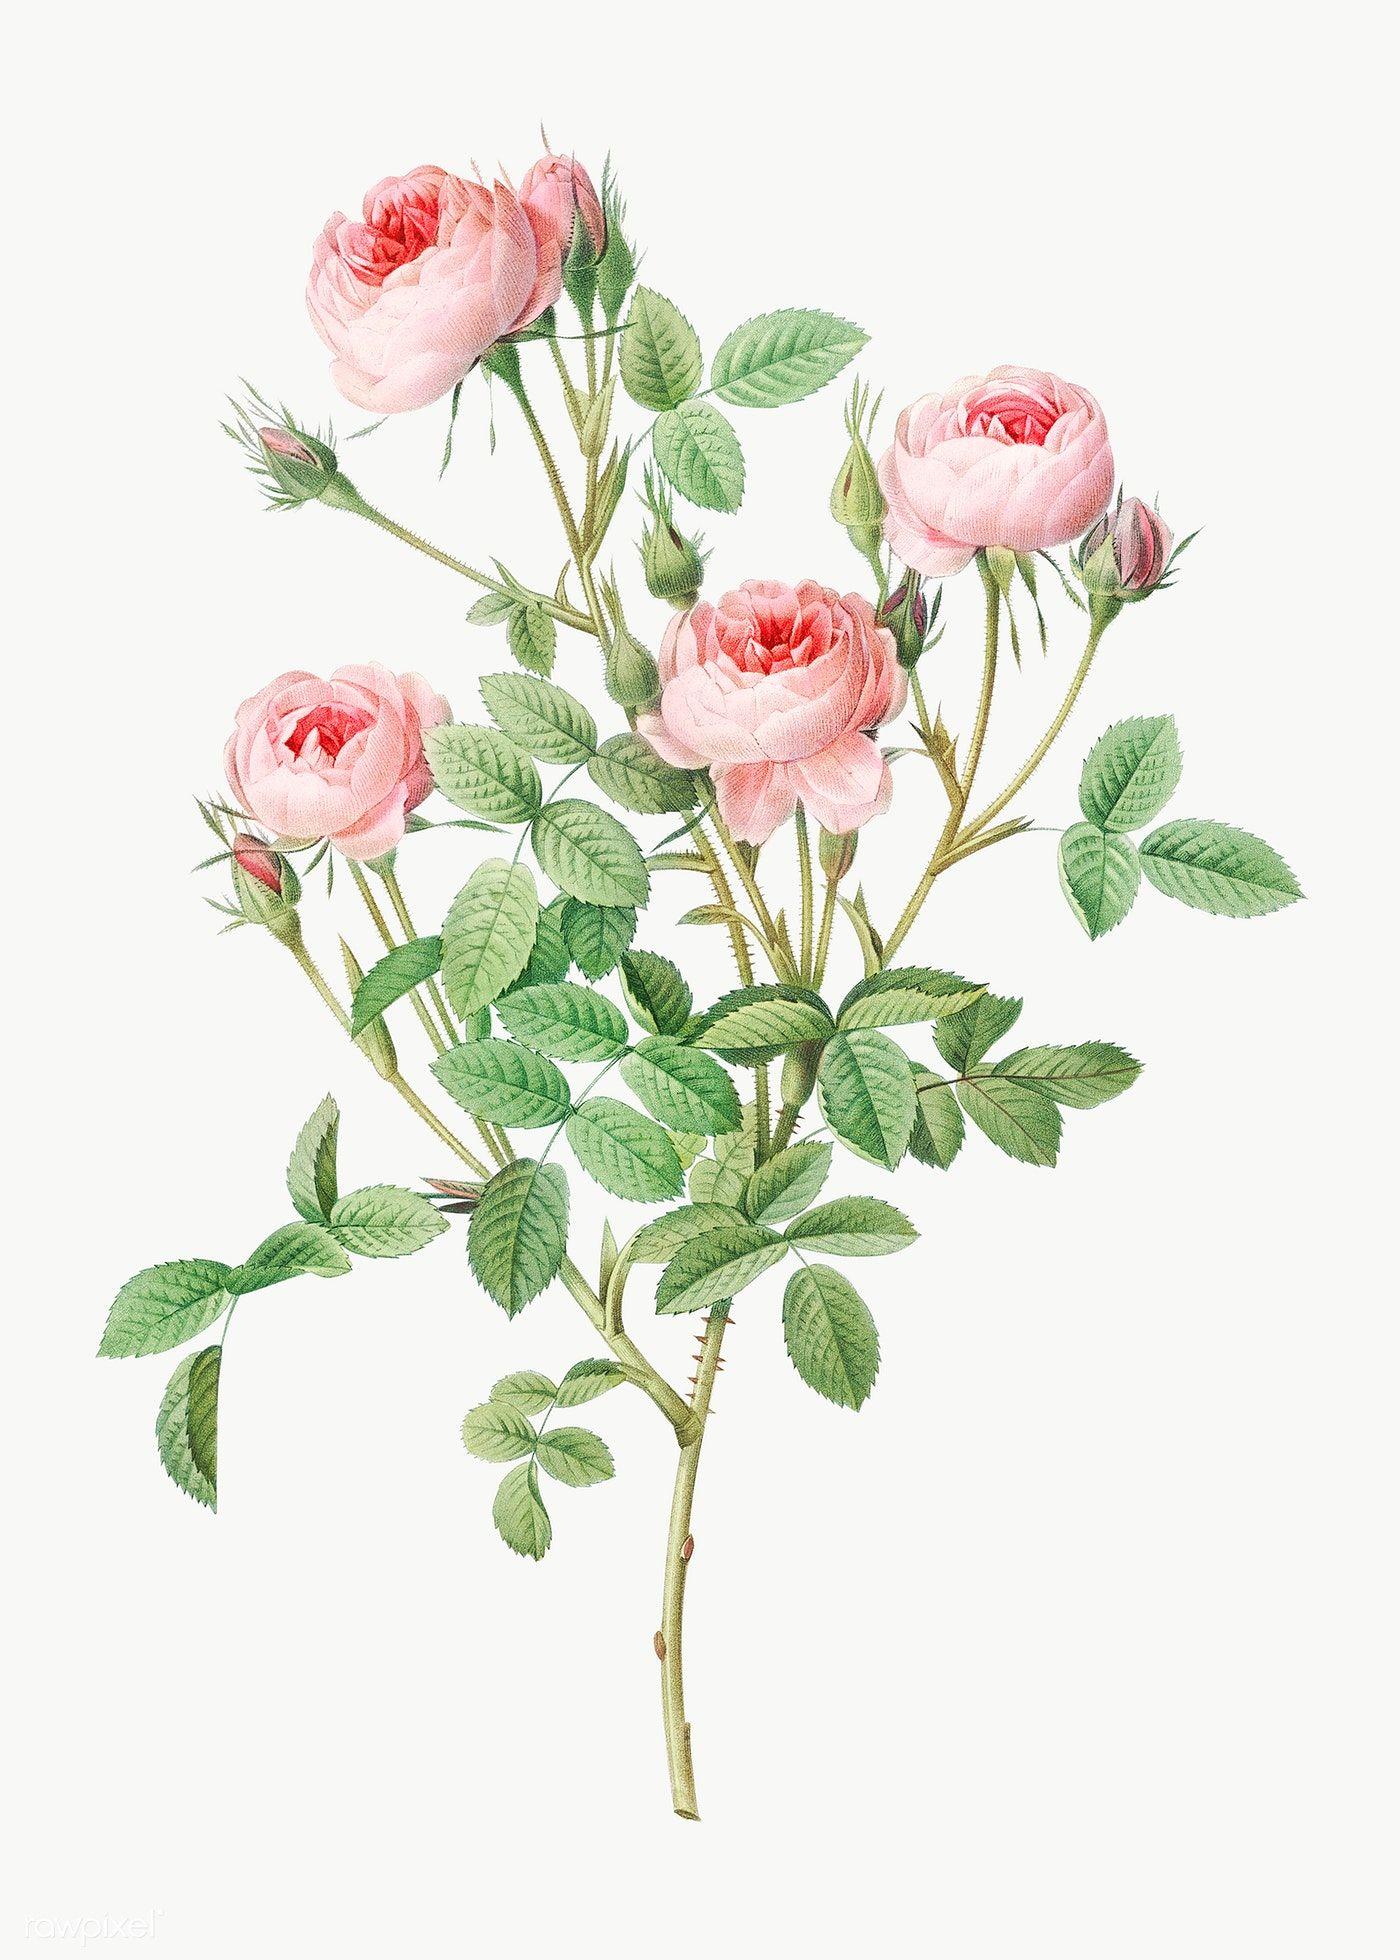 Vintage Burgundian Rose Transparent Png Free Image By Rawpixel Com In 2020 Flower Drawing Roses Drawing Flower Illustration